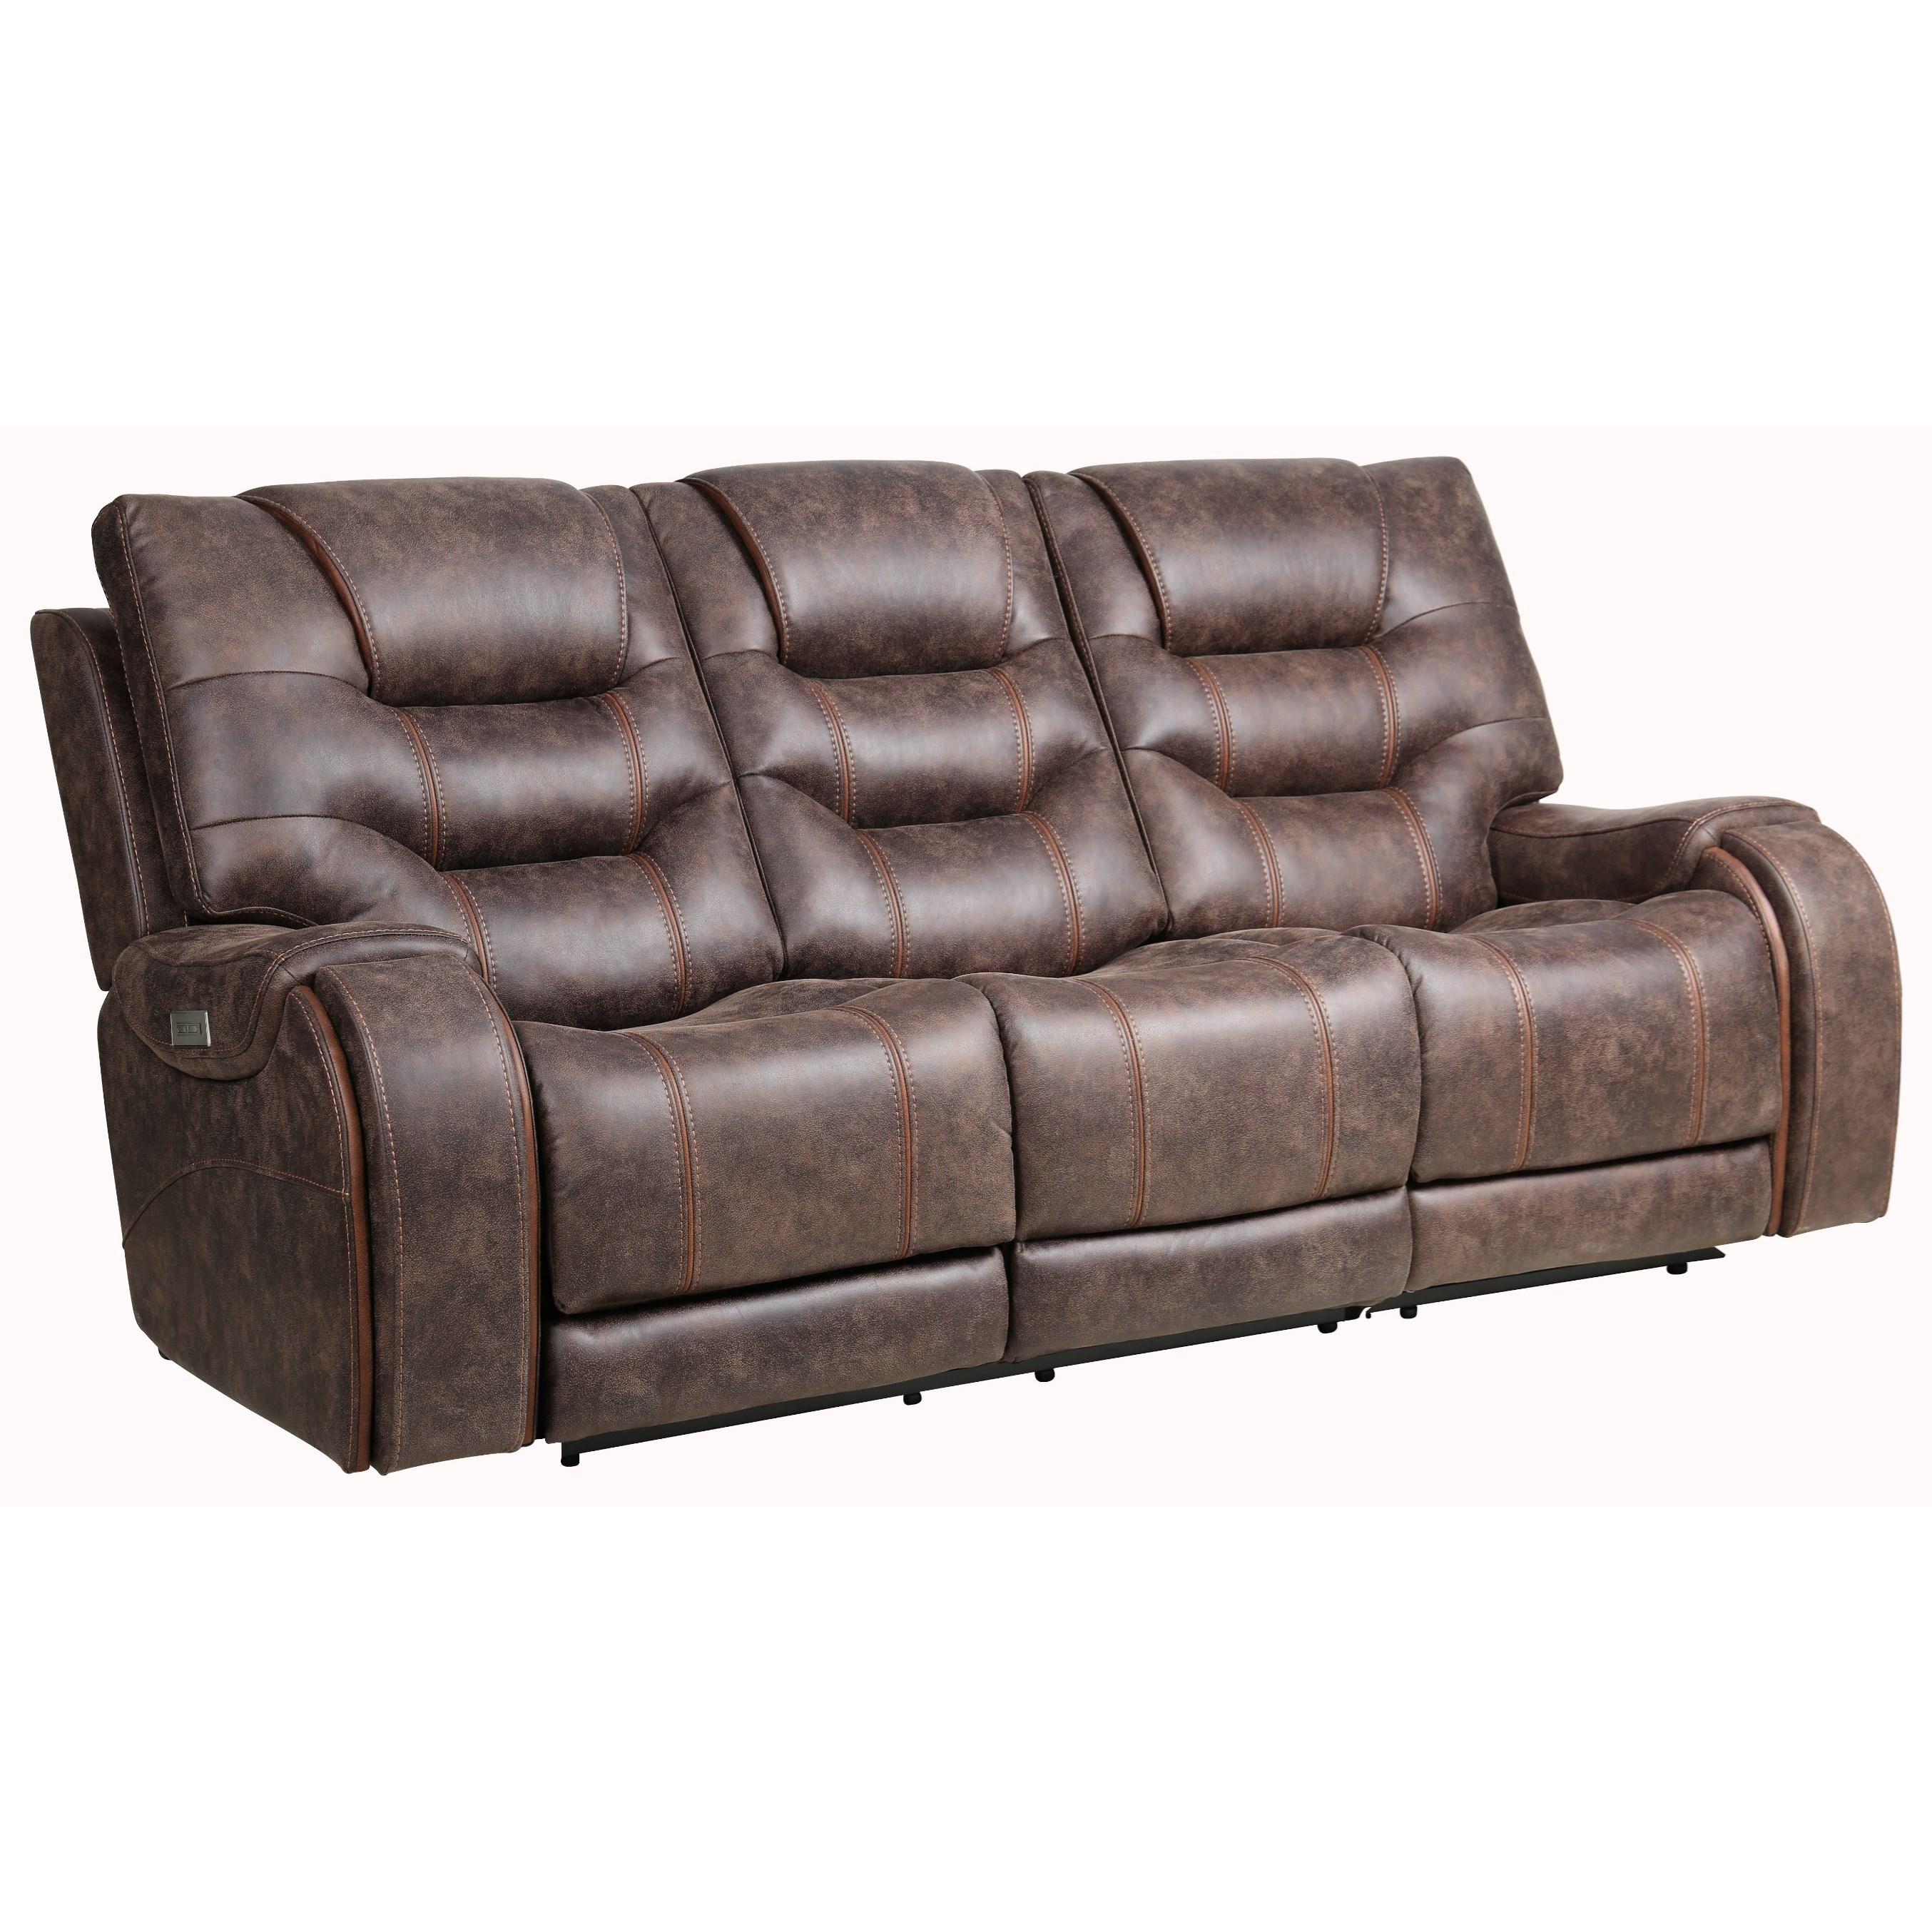 Warehouse M 2-Piece Power Reclining Sofa w/ Pwr Headrest by Moto Motion at Pilgrim Furniture City